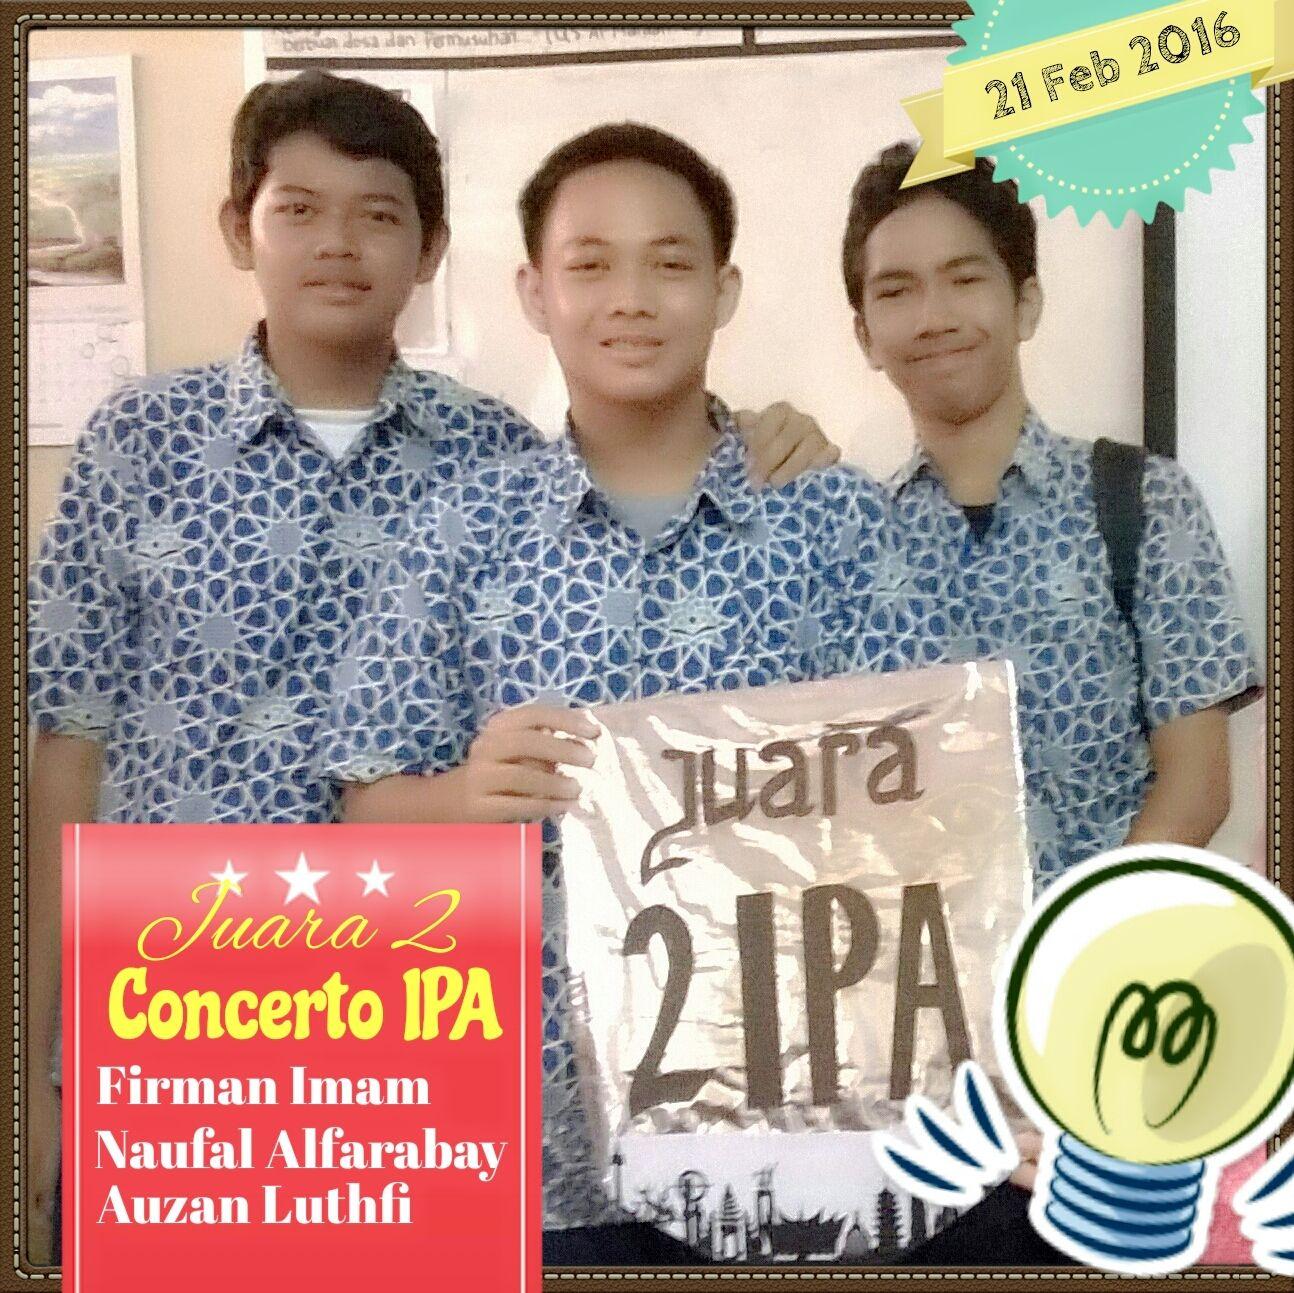 Runner up Concerto IPA